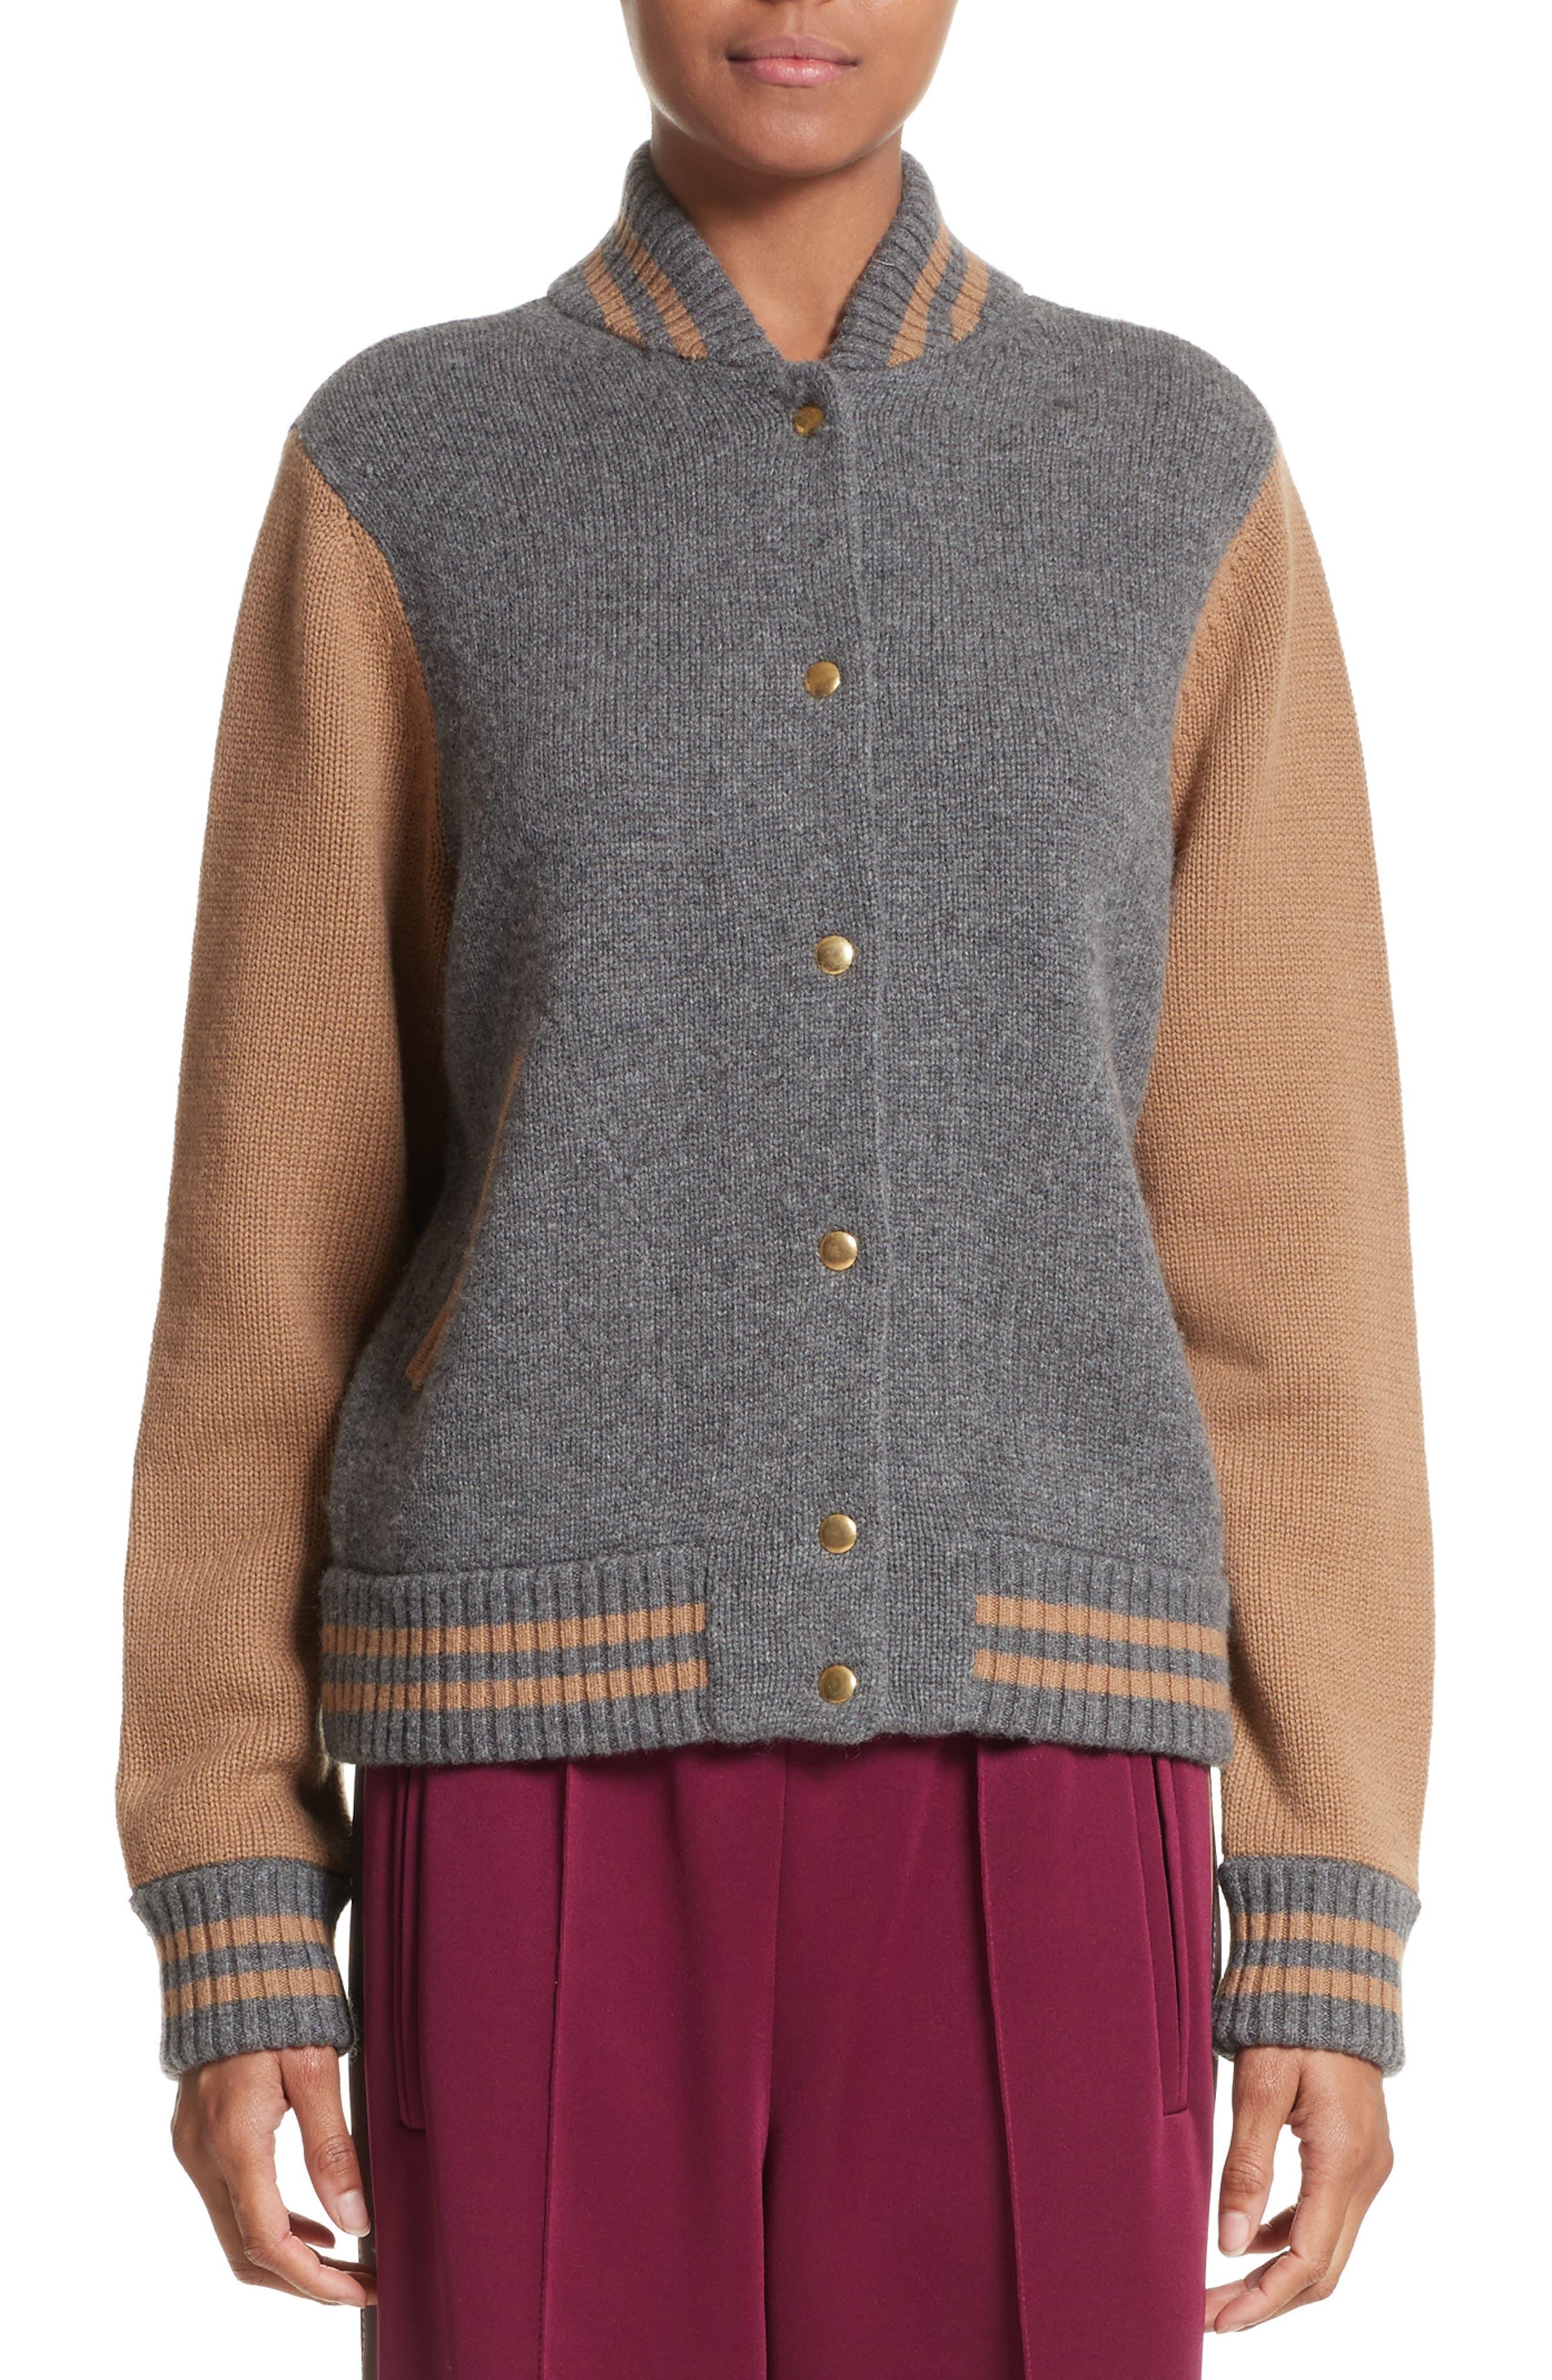 MARC JACOBS Wool & Cashmere Knit Varsity Jacket